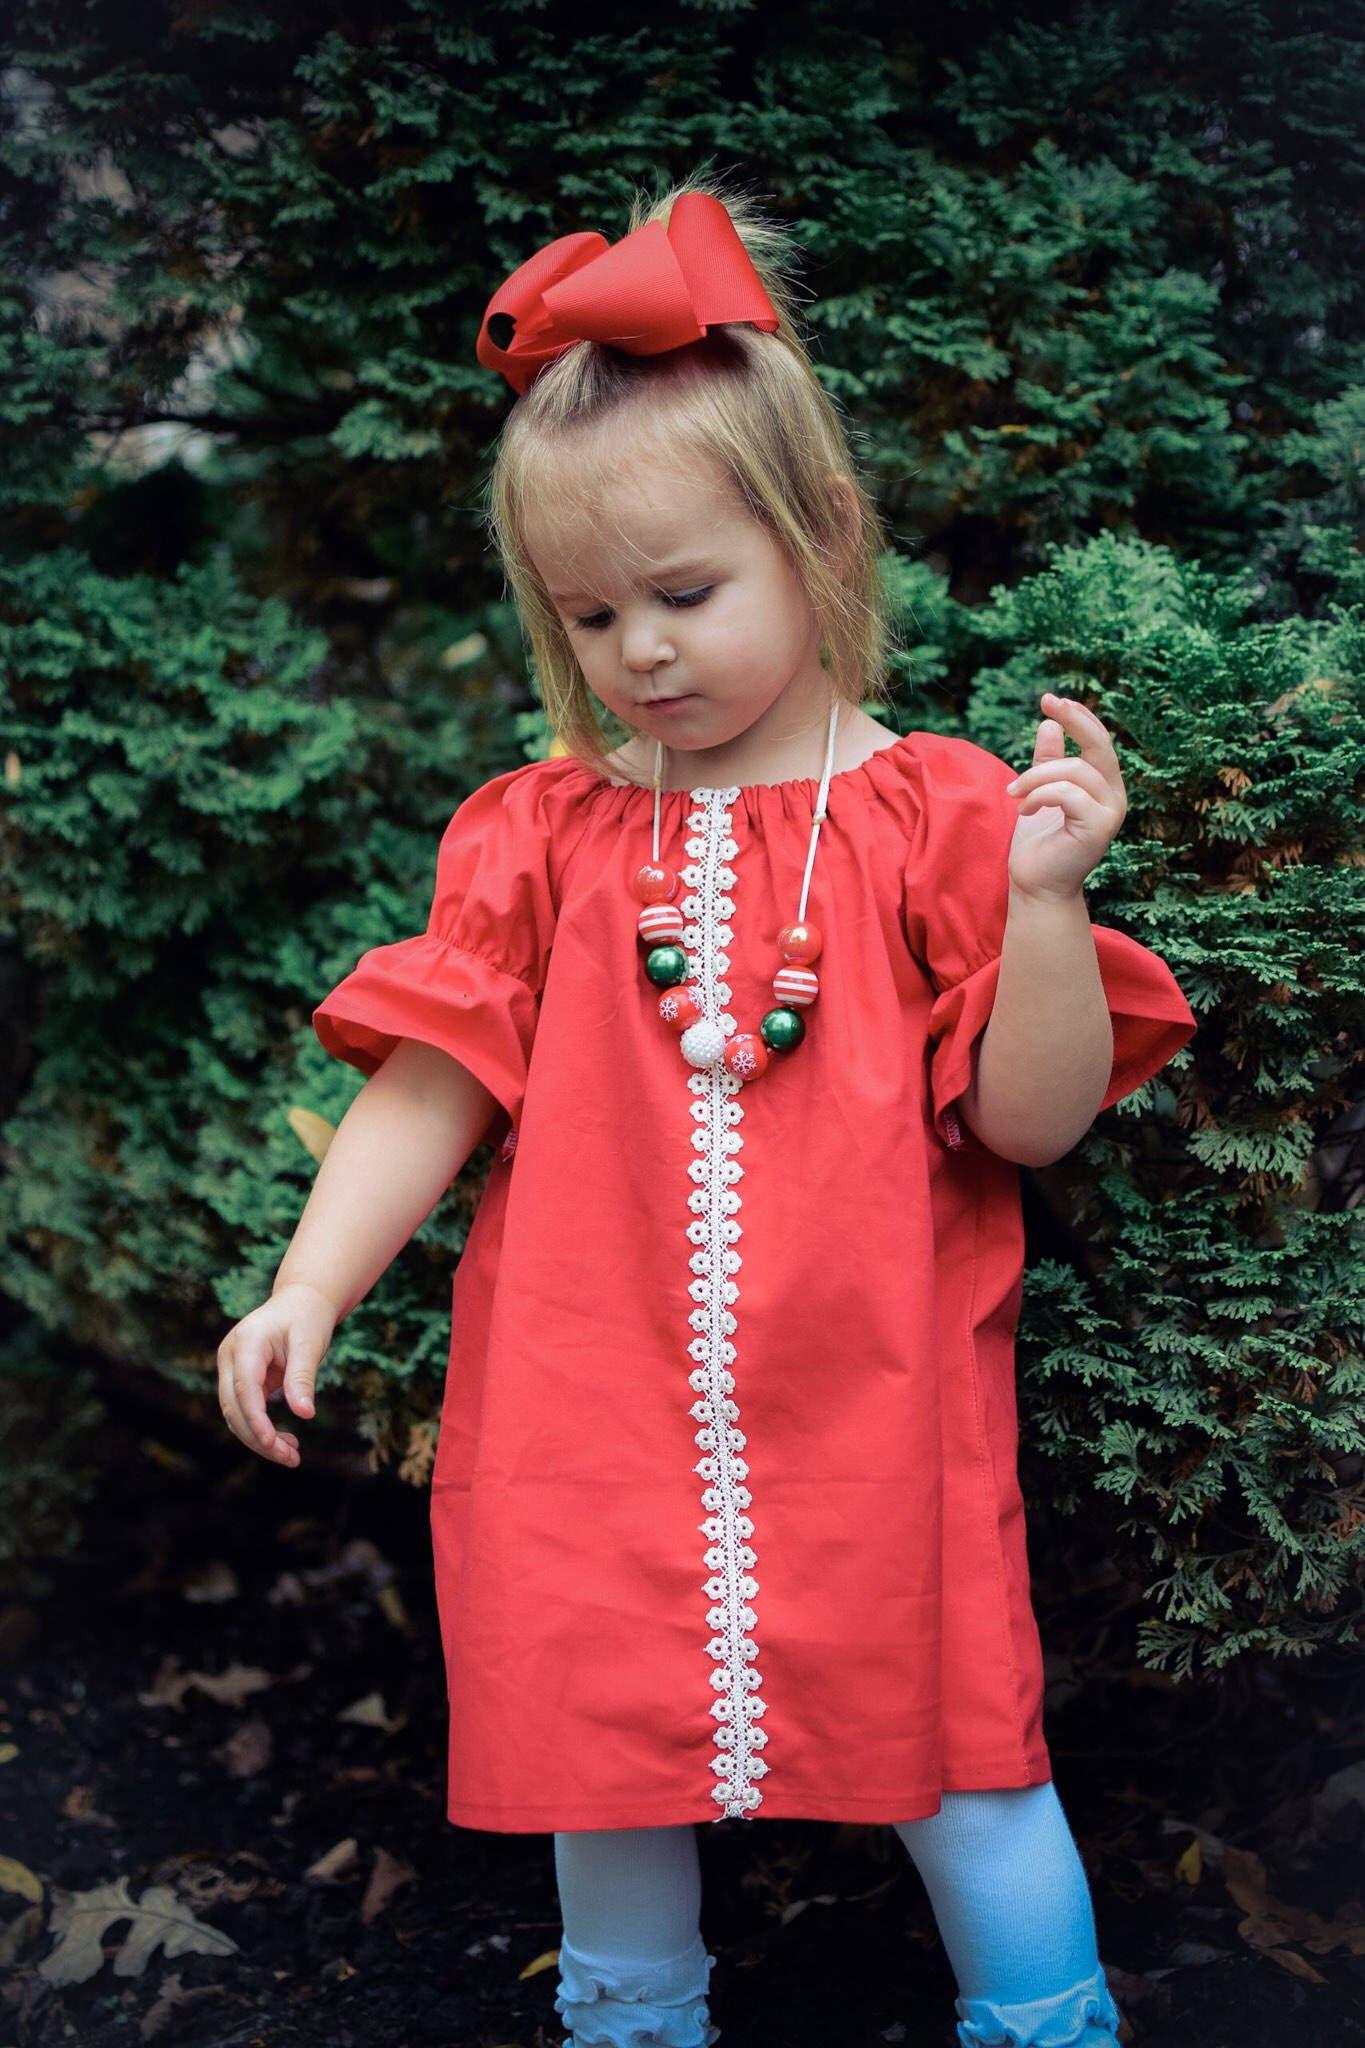 67772cd1b695 Girls Christmas Dress, Girls Christmas Outfit, Girls Red Dress, Baby Christmas  Dress,